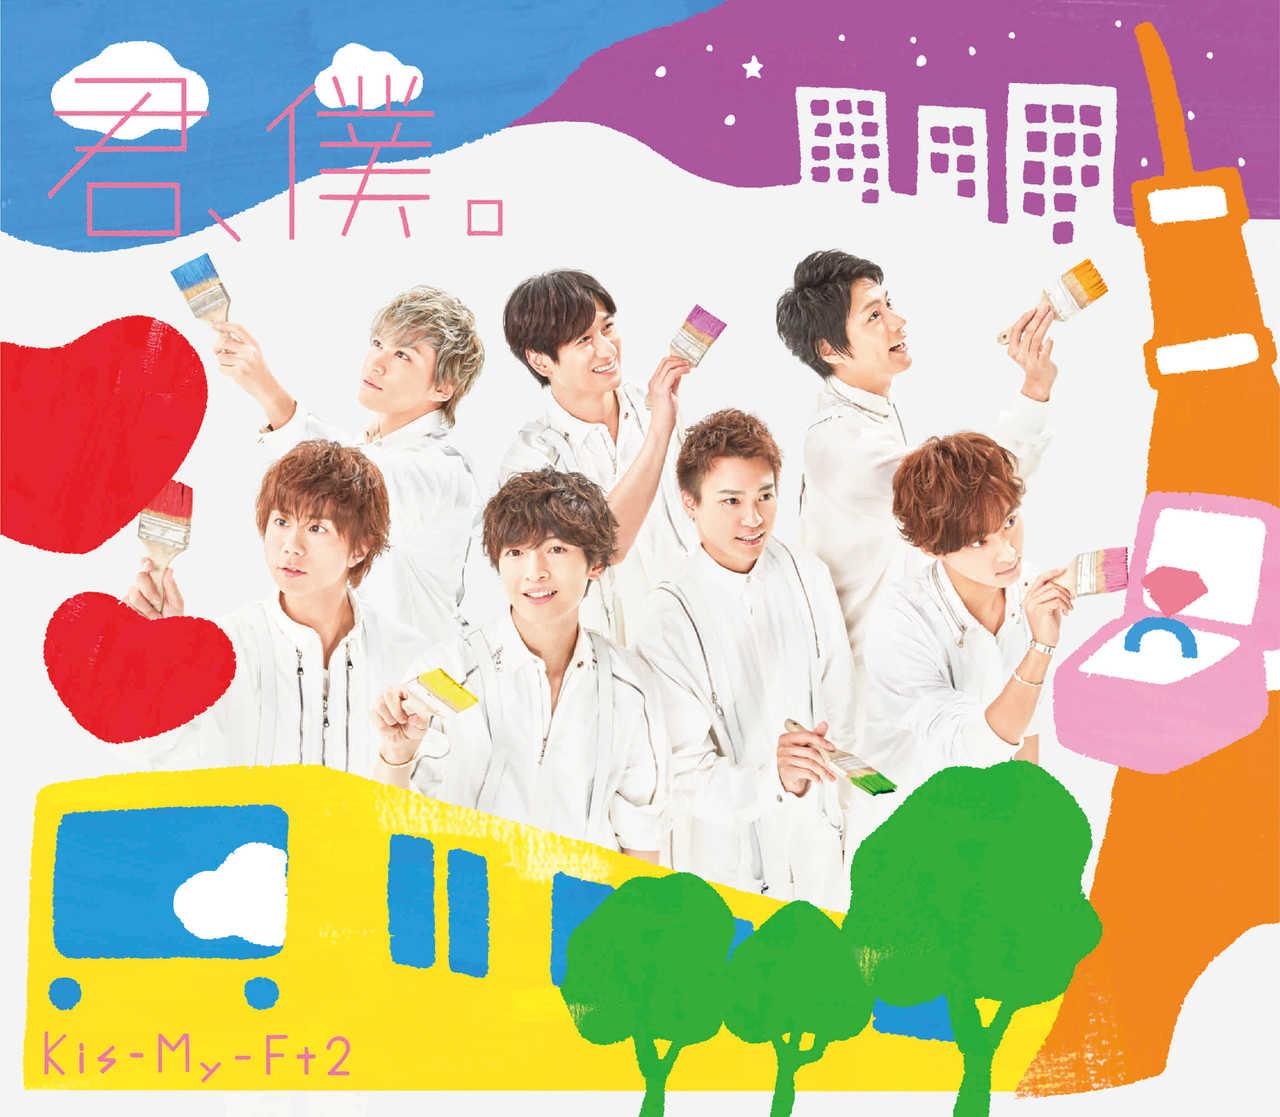 Kis-My-Ft2、キスマイ最新シングル「君、僕。」が本人出演のCMソングに決定!